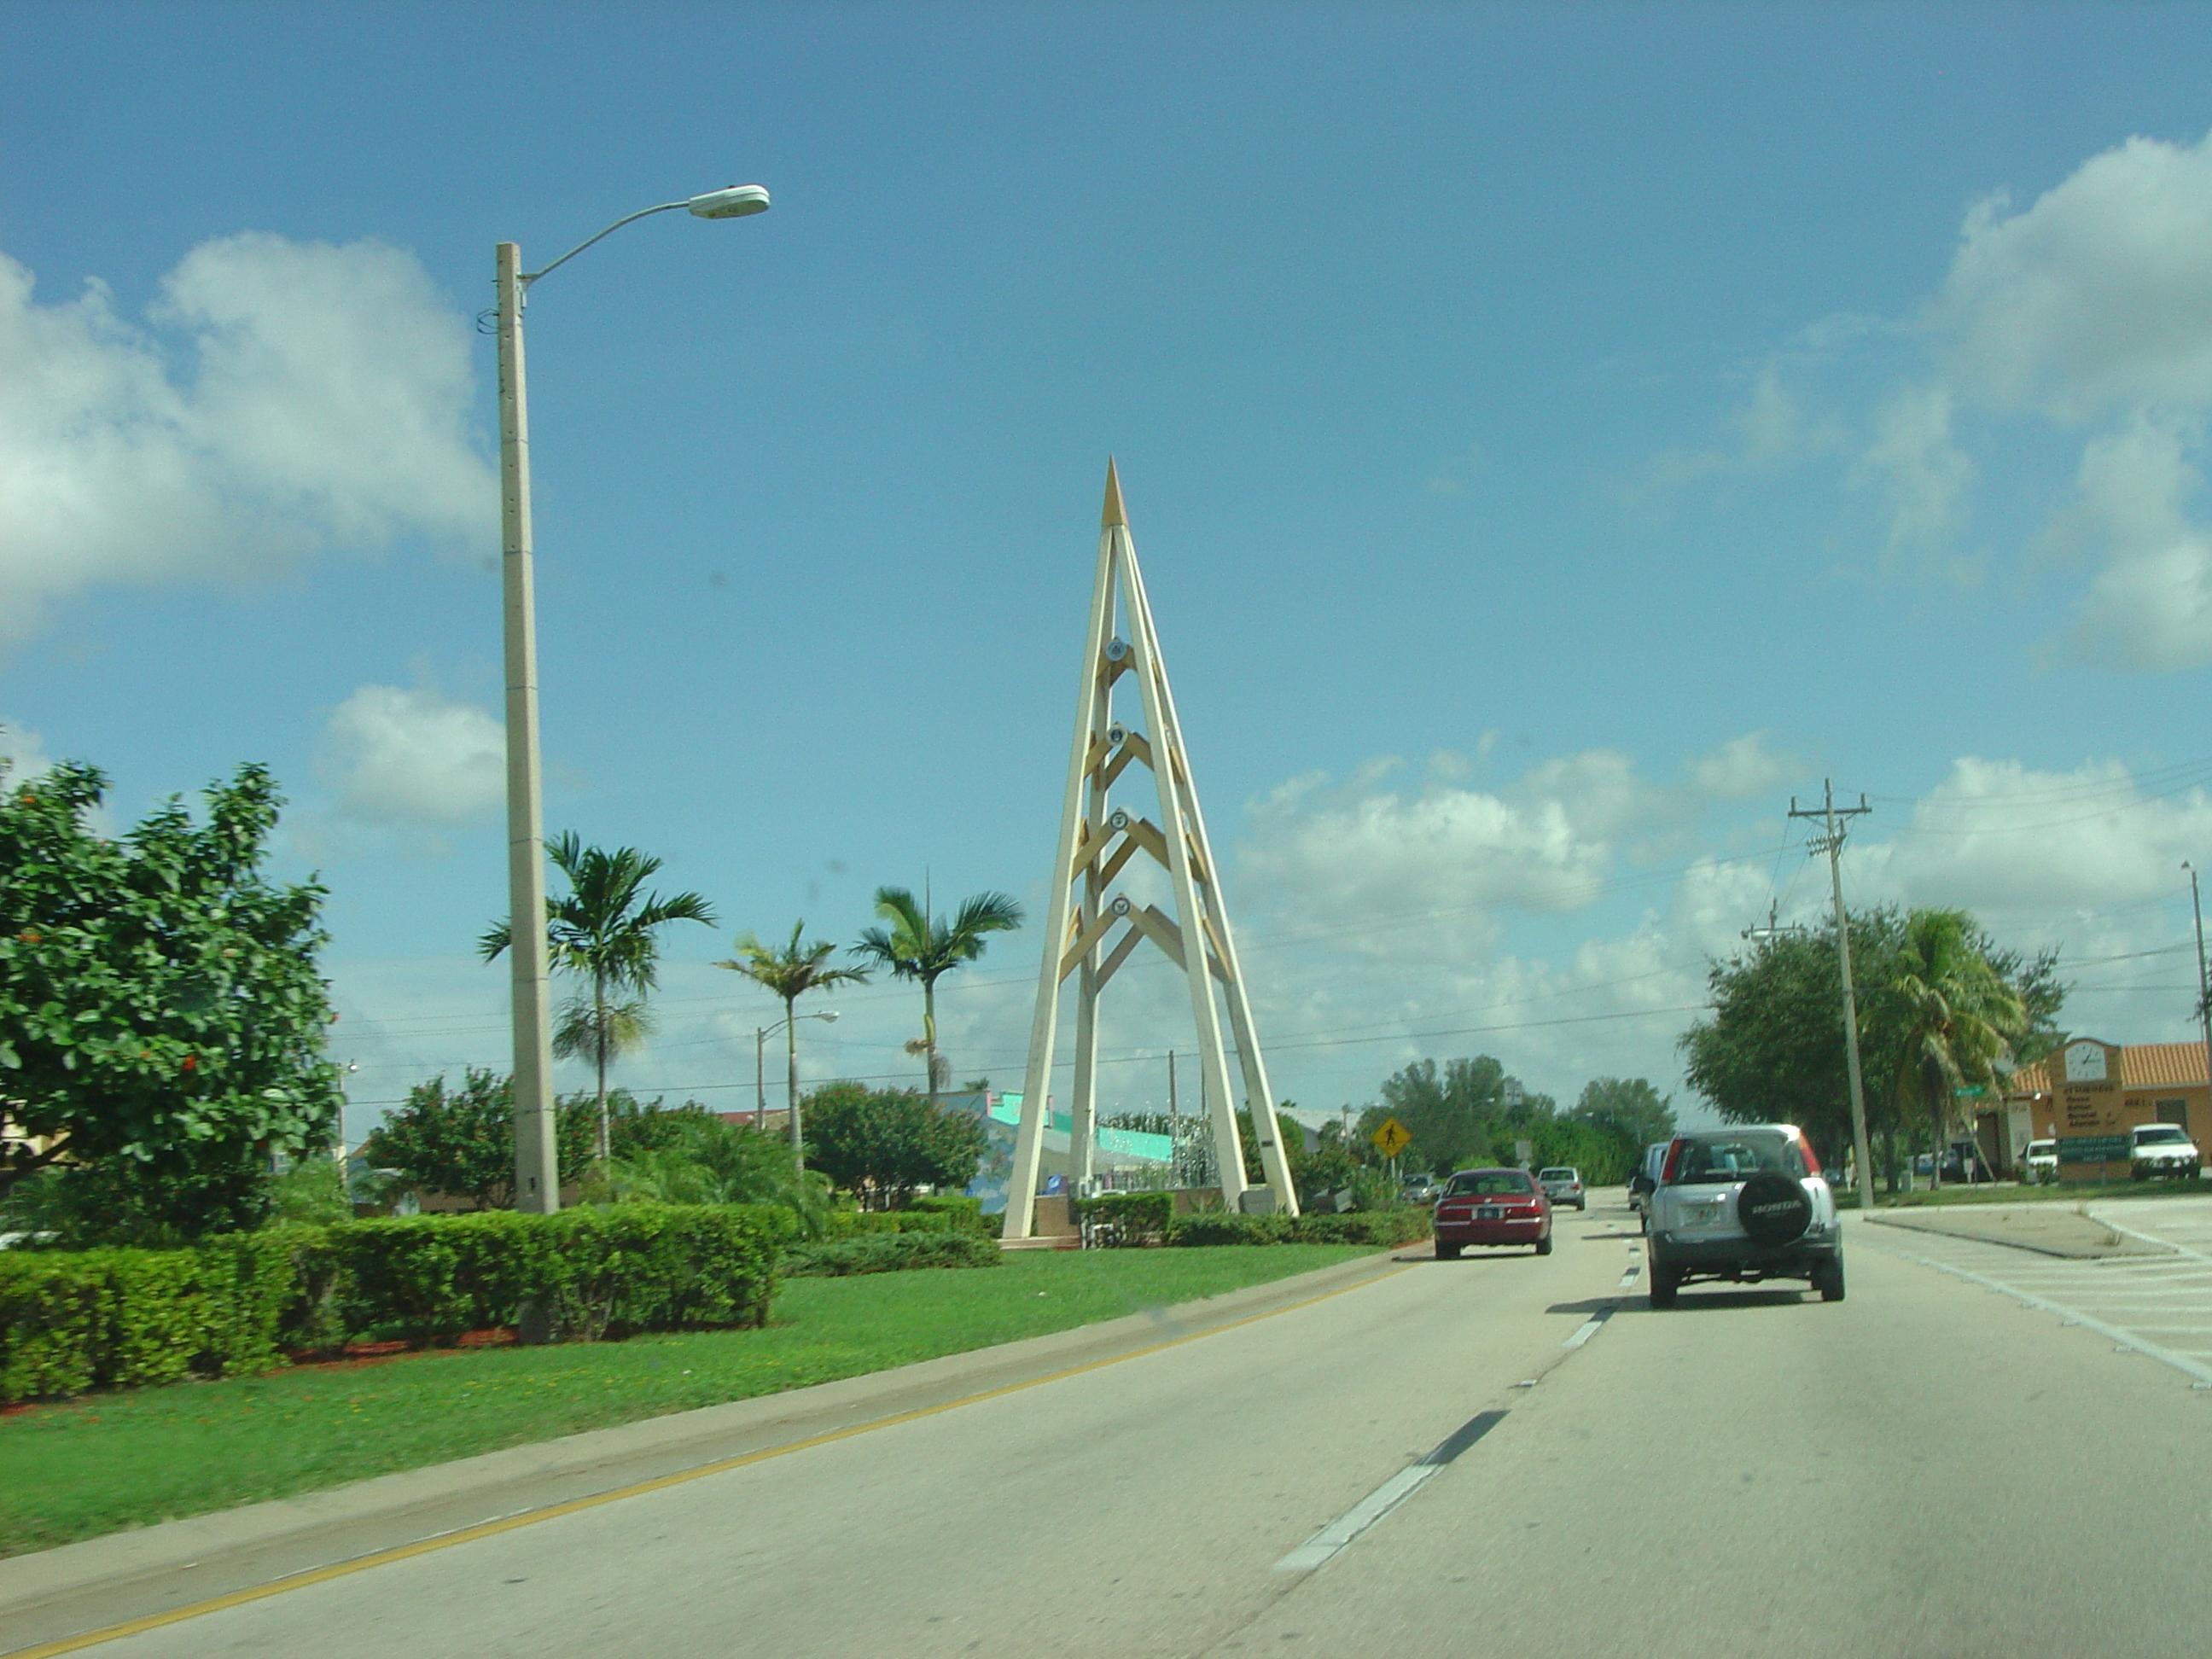 Cape_Coral_monument 2